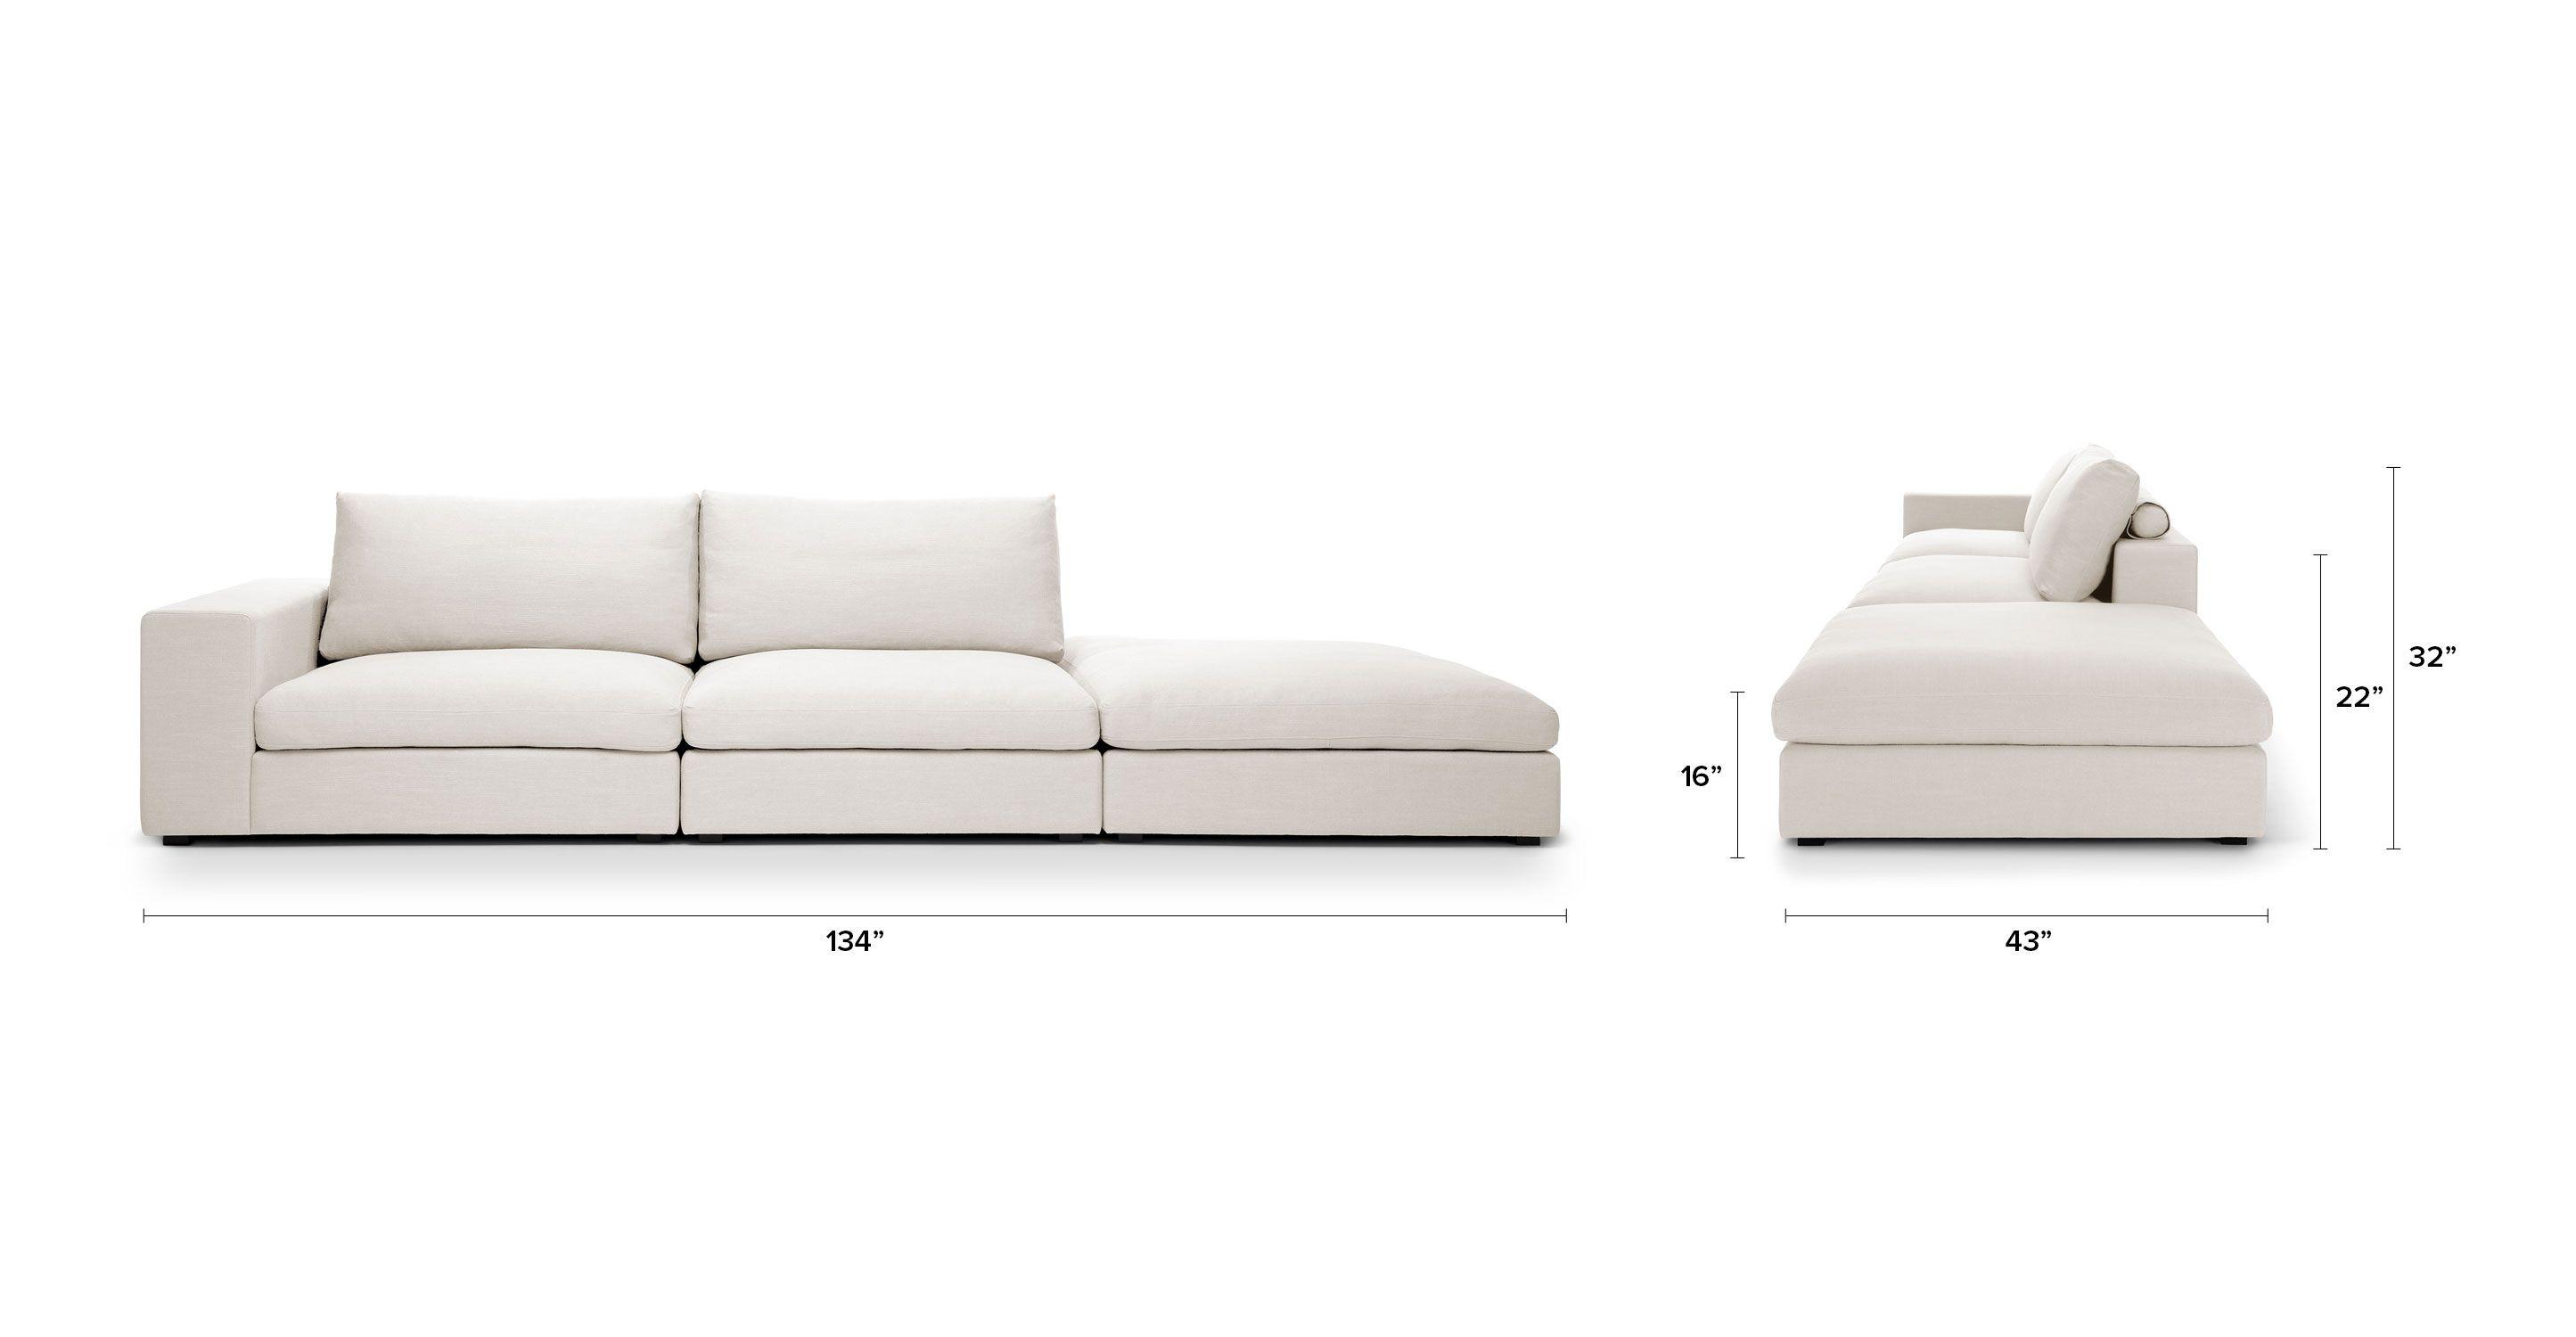 Cube Quartz White Modular Sofa Left Arm Sofas Bryght Modern